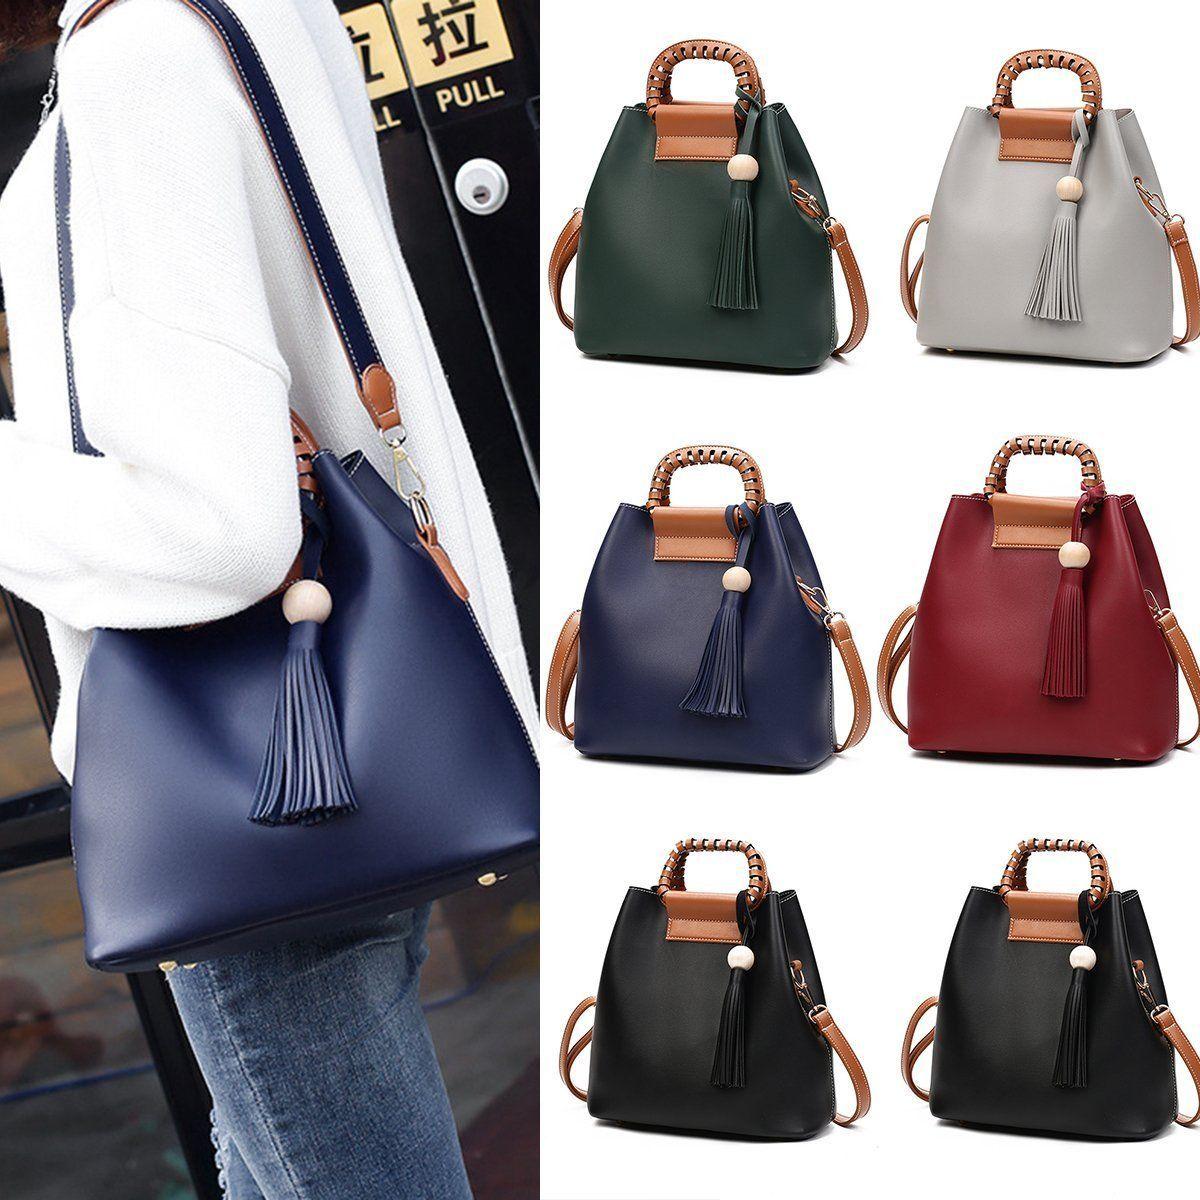 Women Handbag Shoulder Bags Tote Purse Lady Messenger Hobo Satchel  Crossbody Bag c96a6c8ee4577